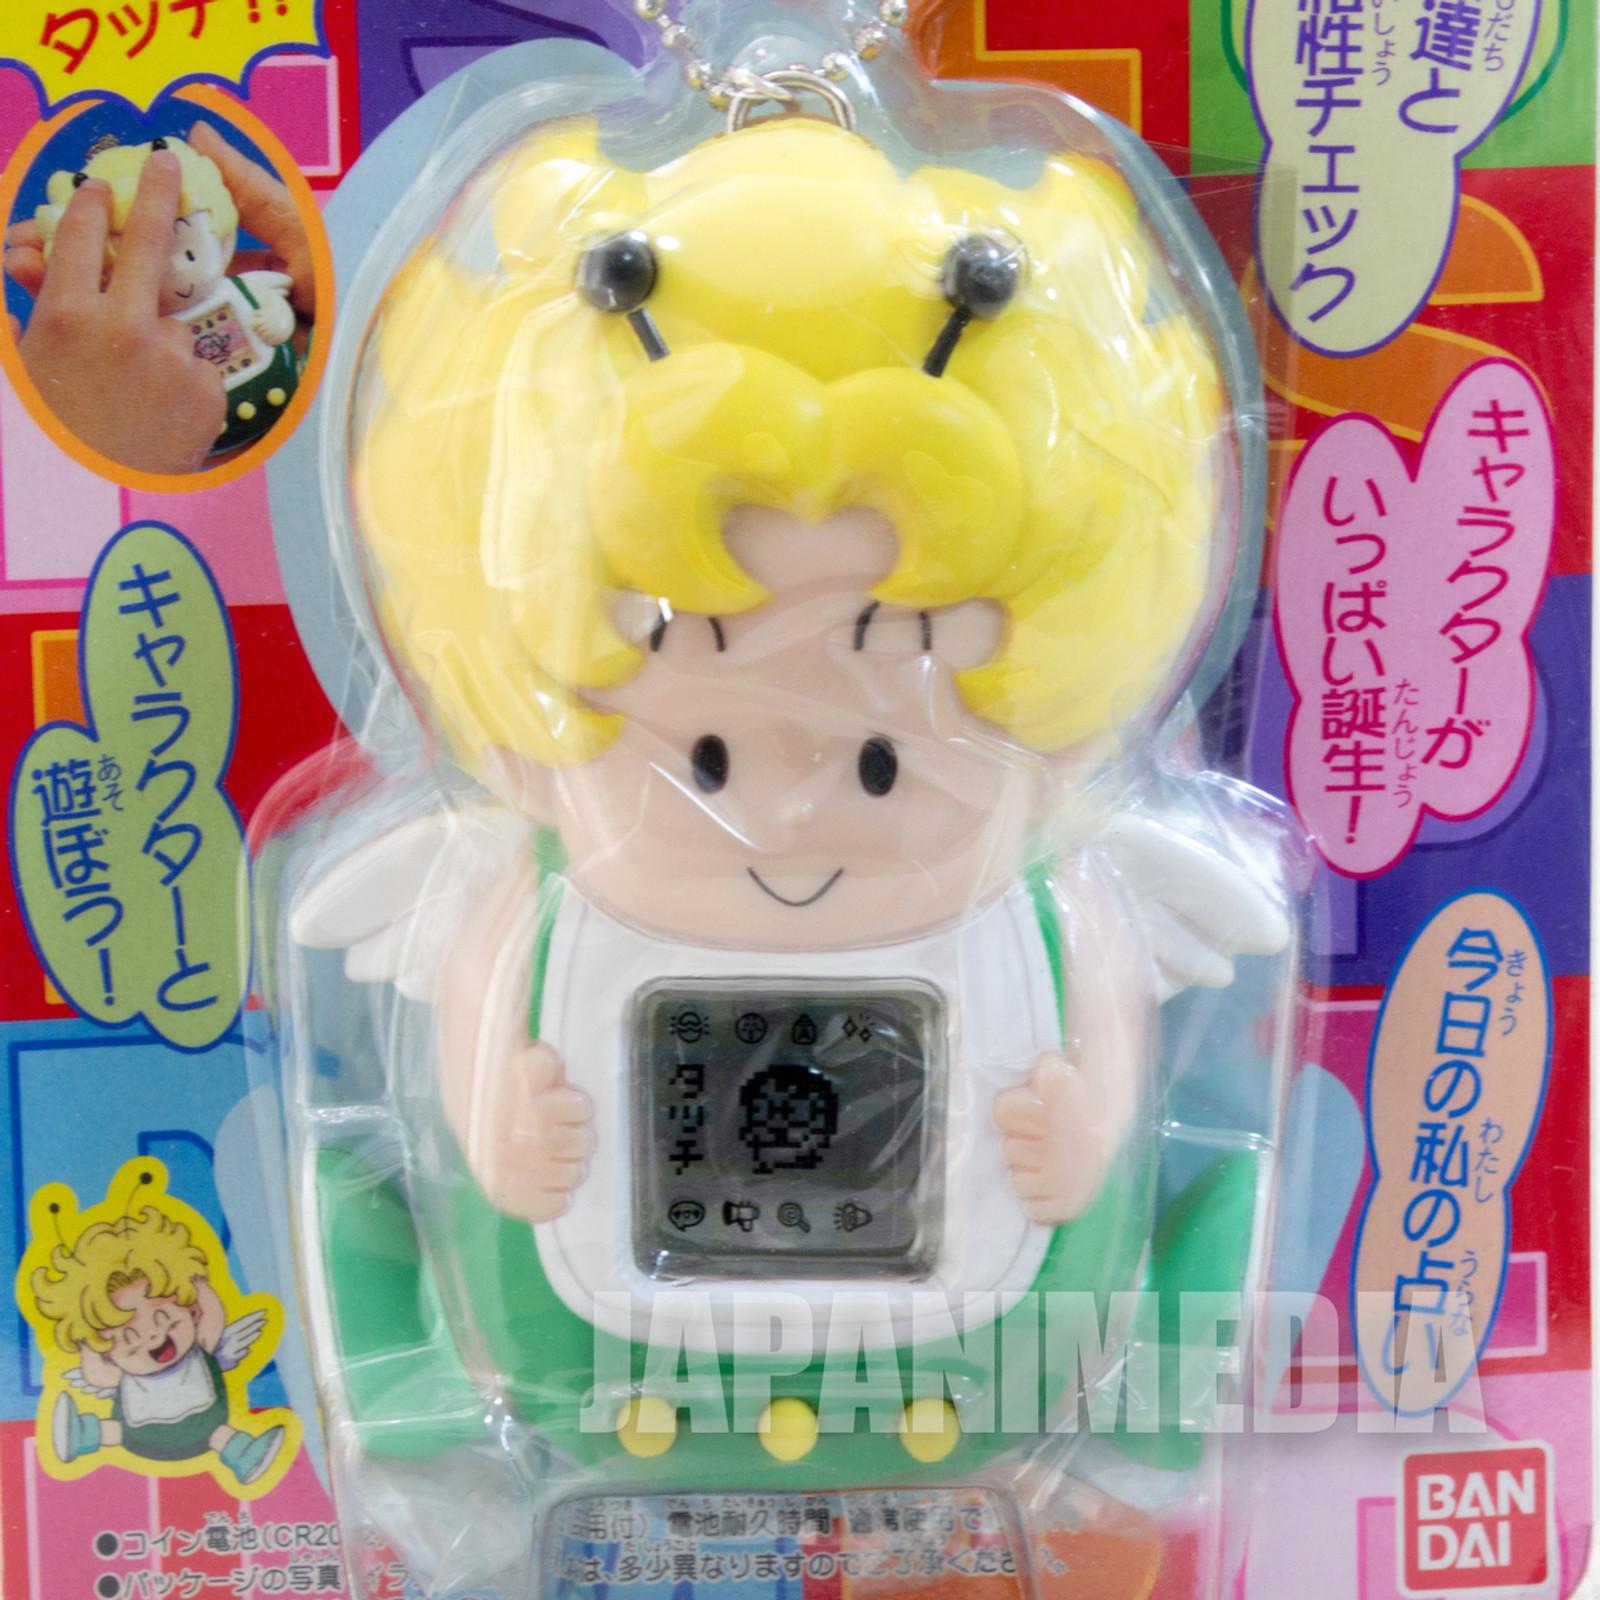 Dr. Slump Arale chan Gatchan Sukisuki Touch BANDAI JAPAN ANIME MANGA